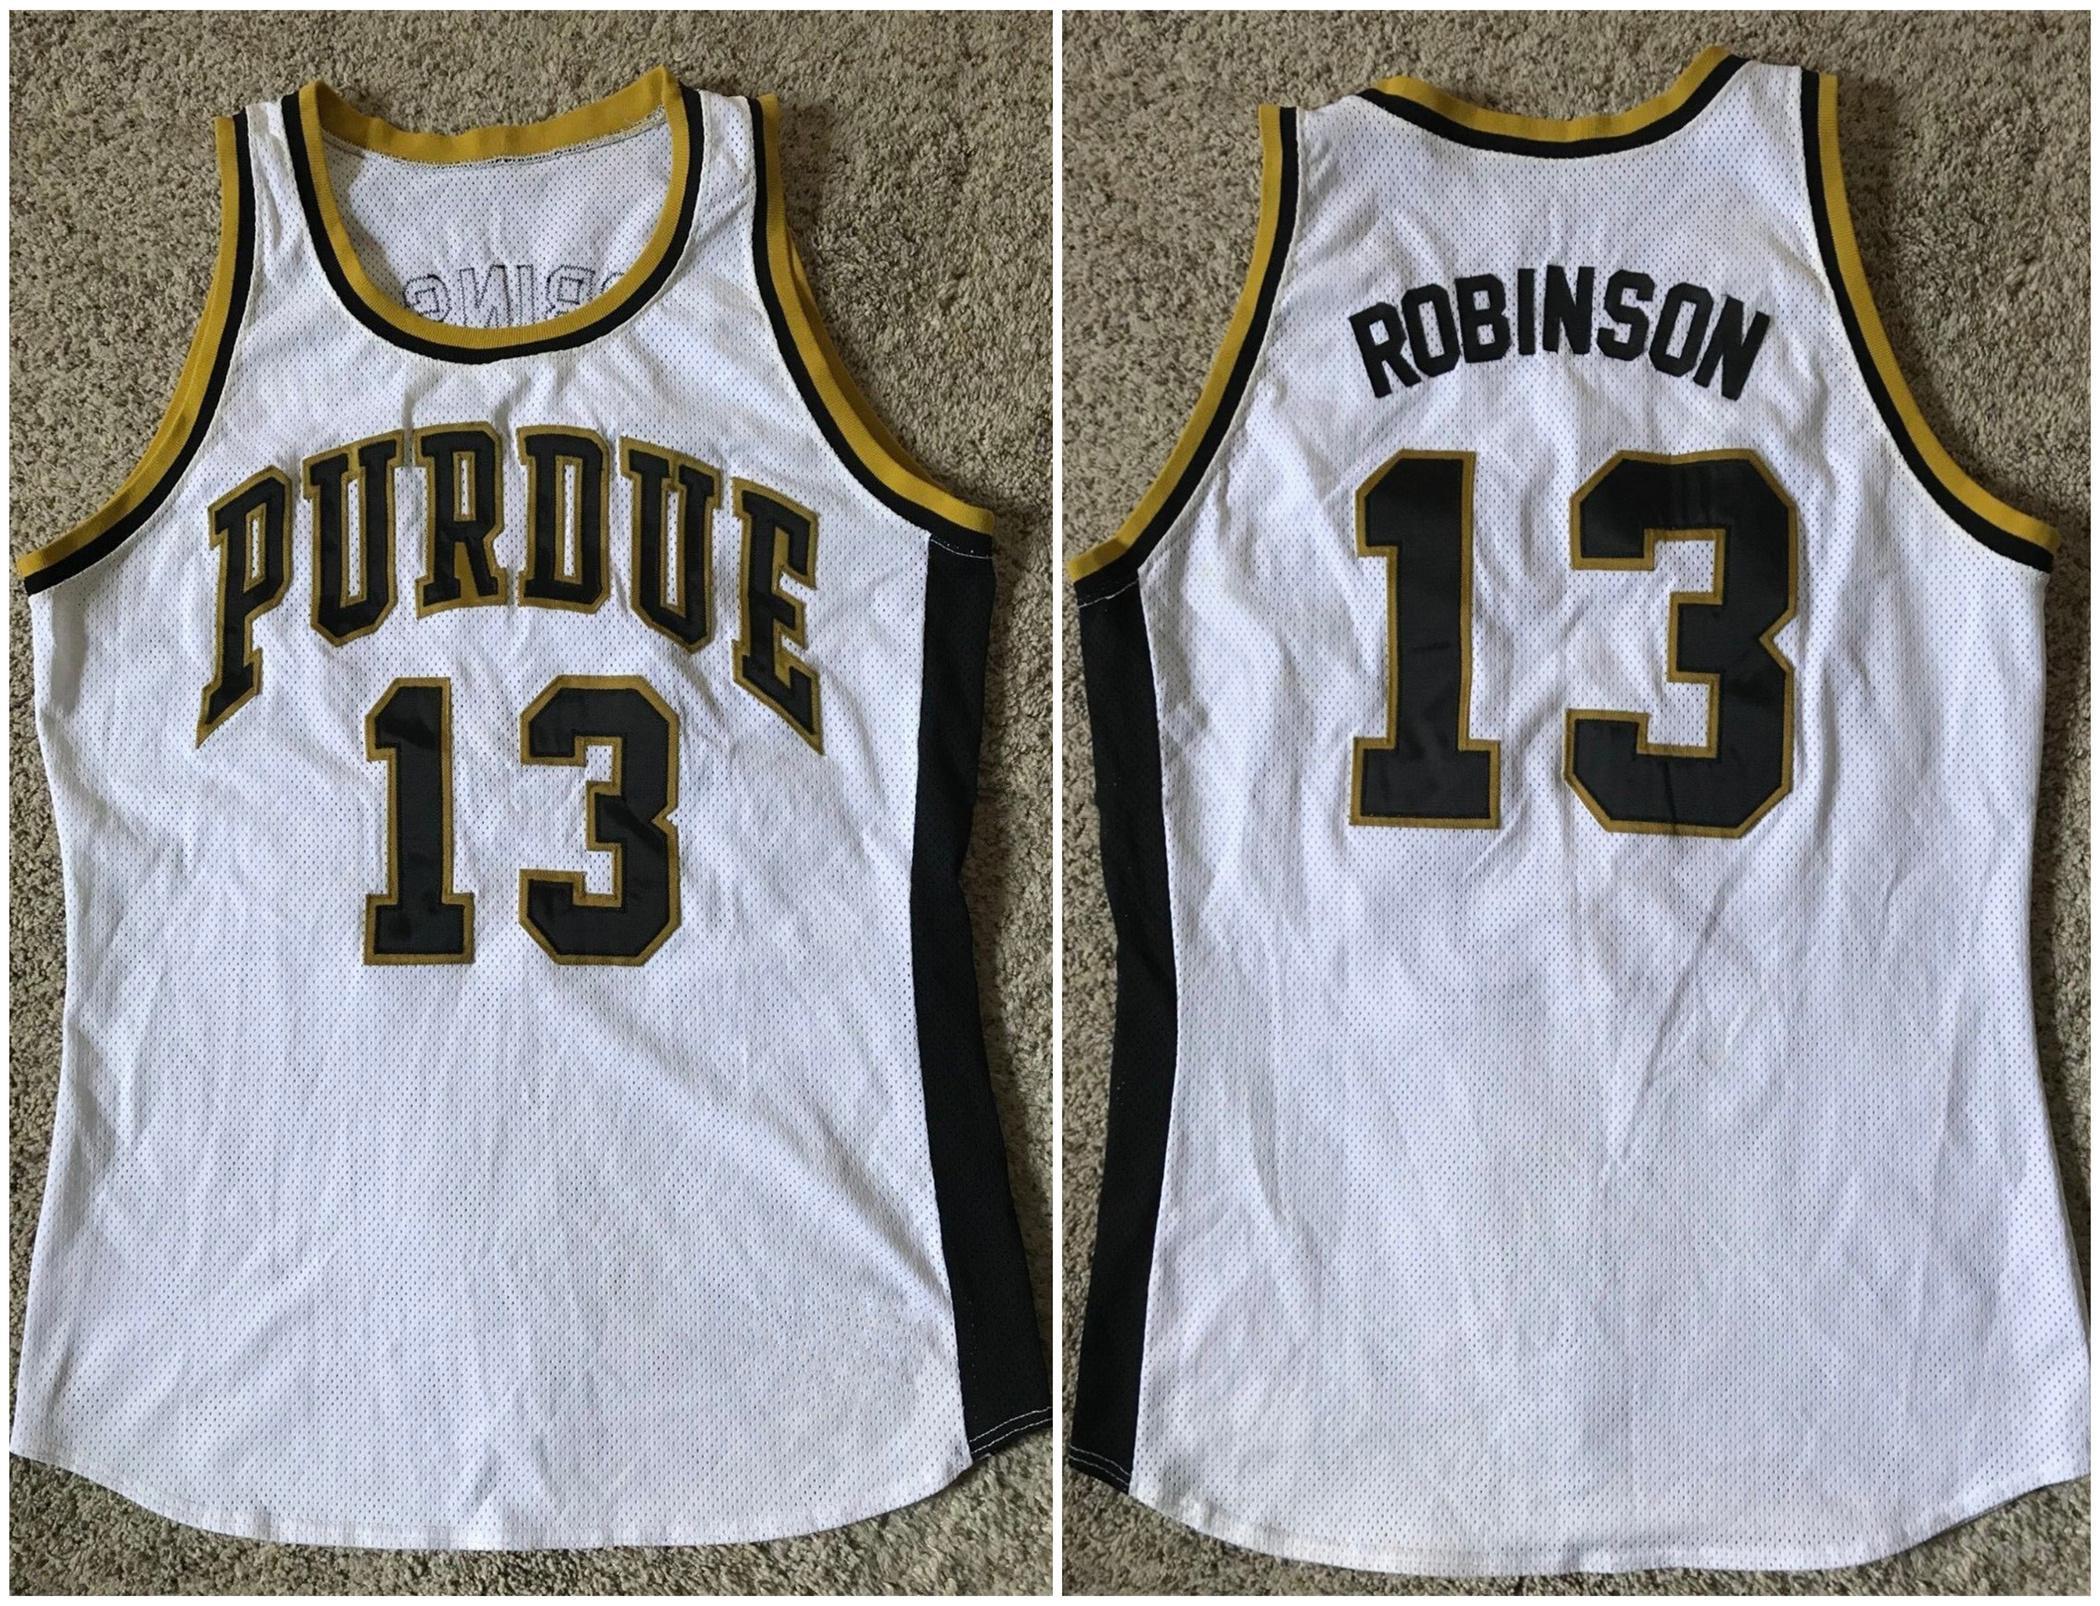 # 13 GLENN ROBINSON PURDUE RETRO BULLAKERS College Retro Basketball Jersey Mens Personnalisé Nom Numes Nom Jerseys